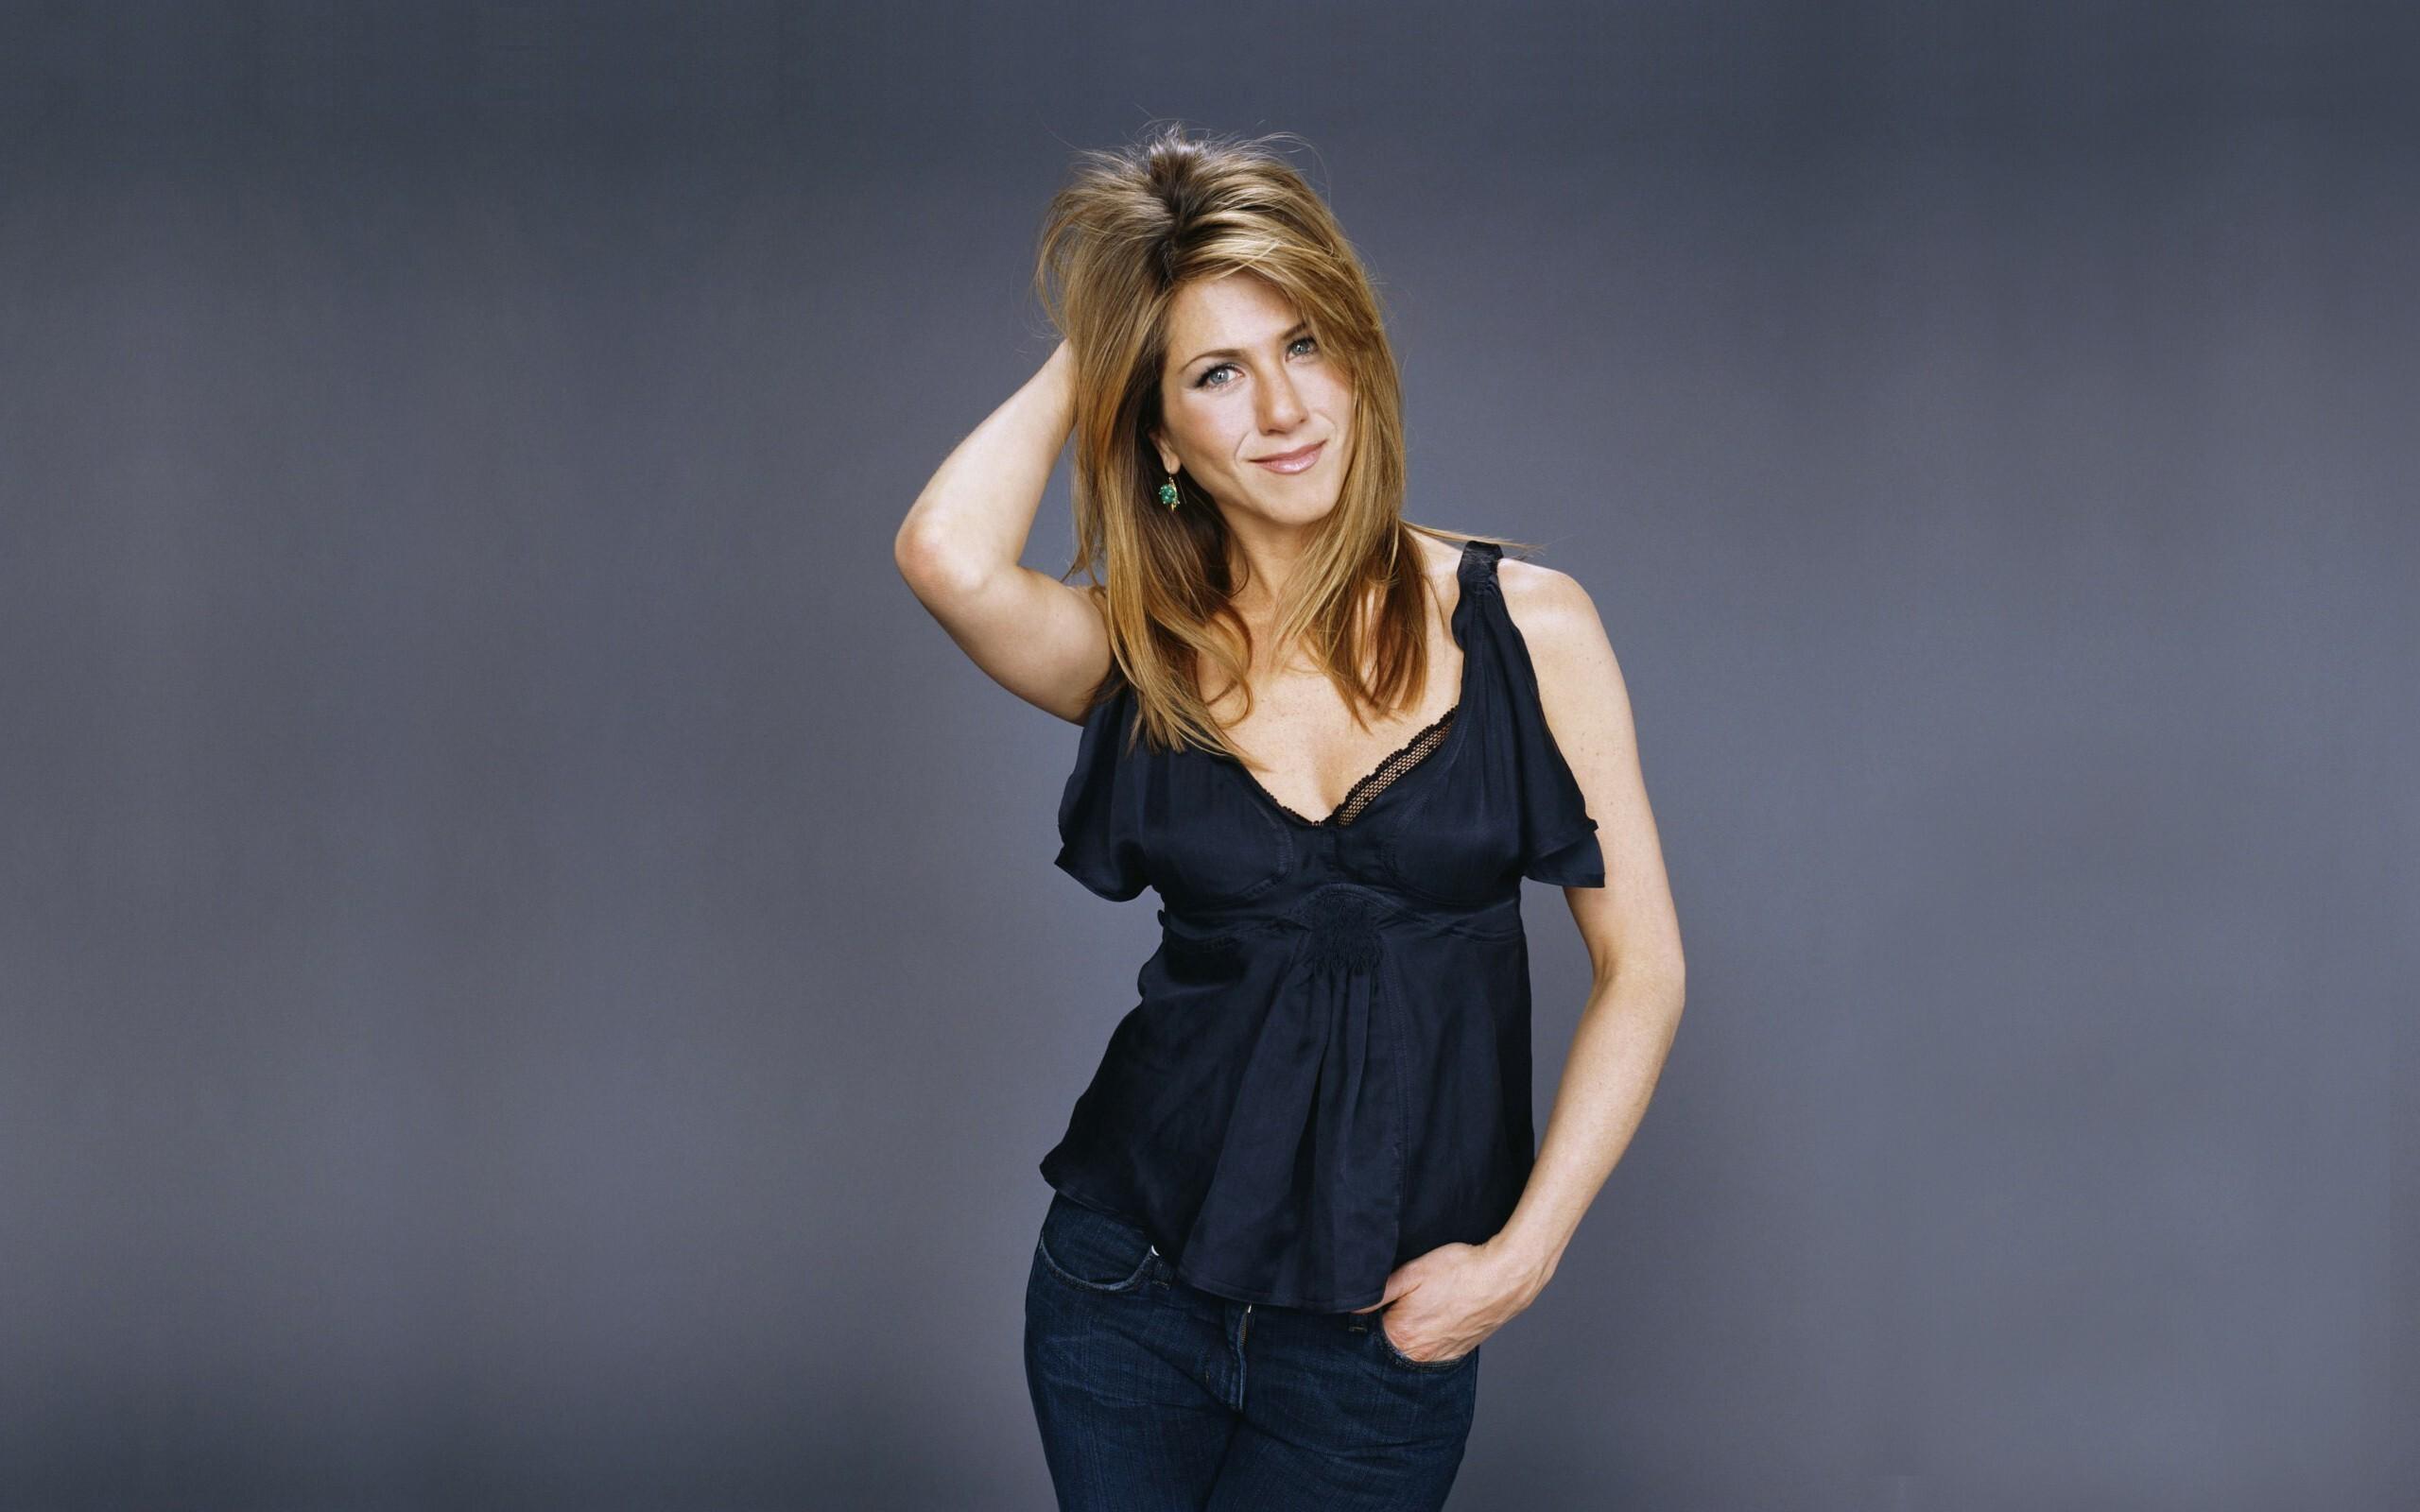 Jennifer Aniston Hd Wallpapers Hd Wallpapers